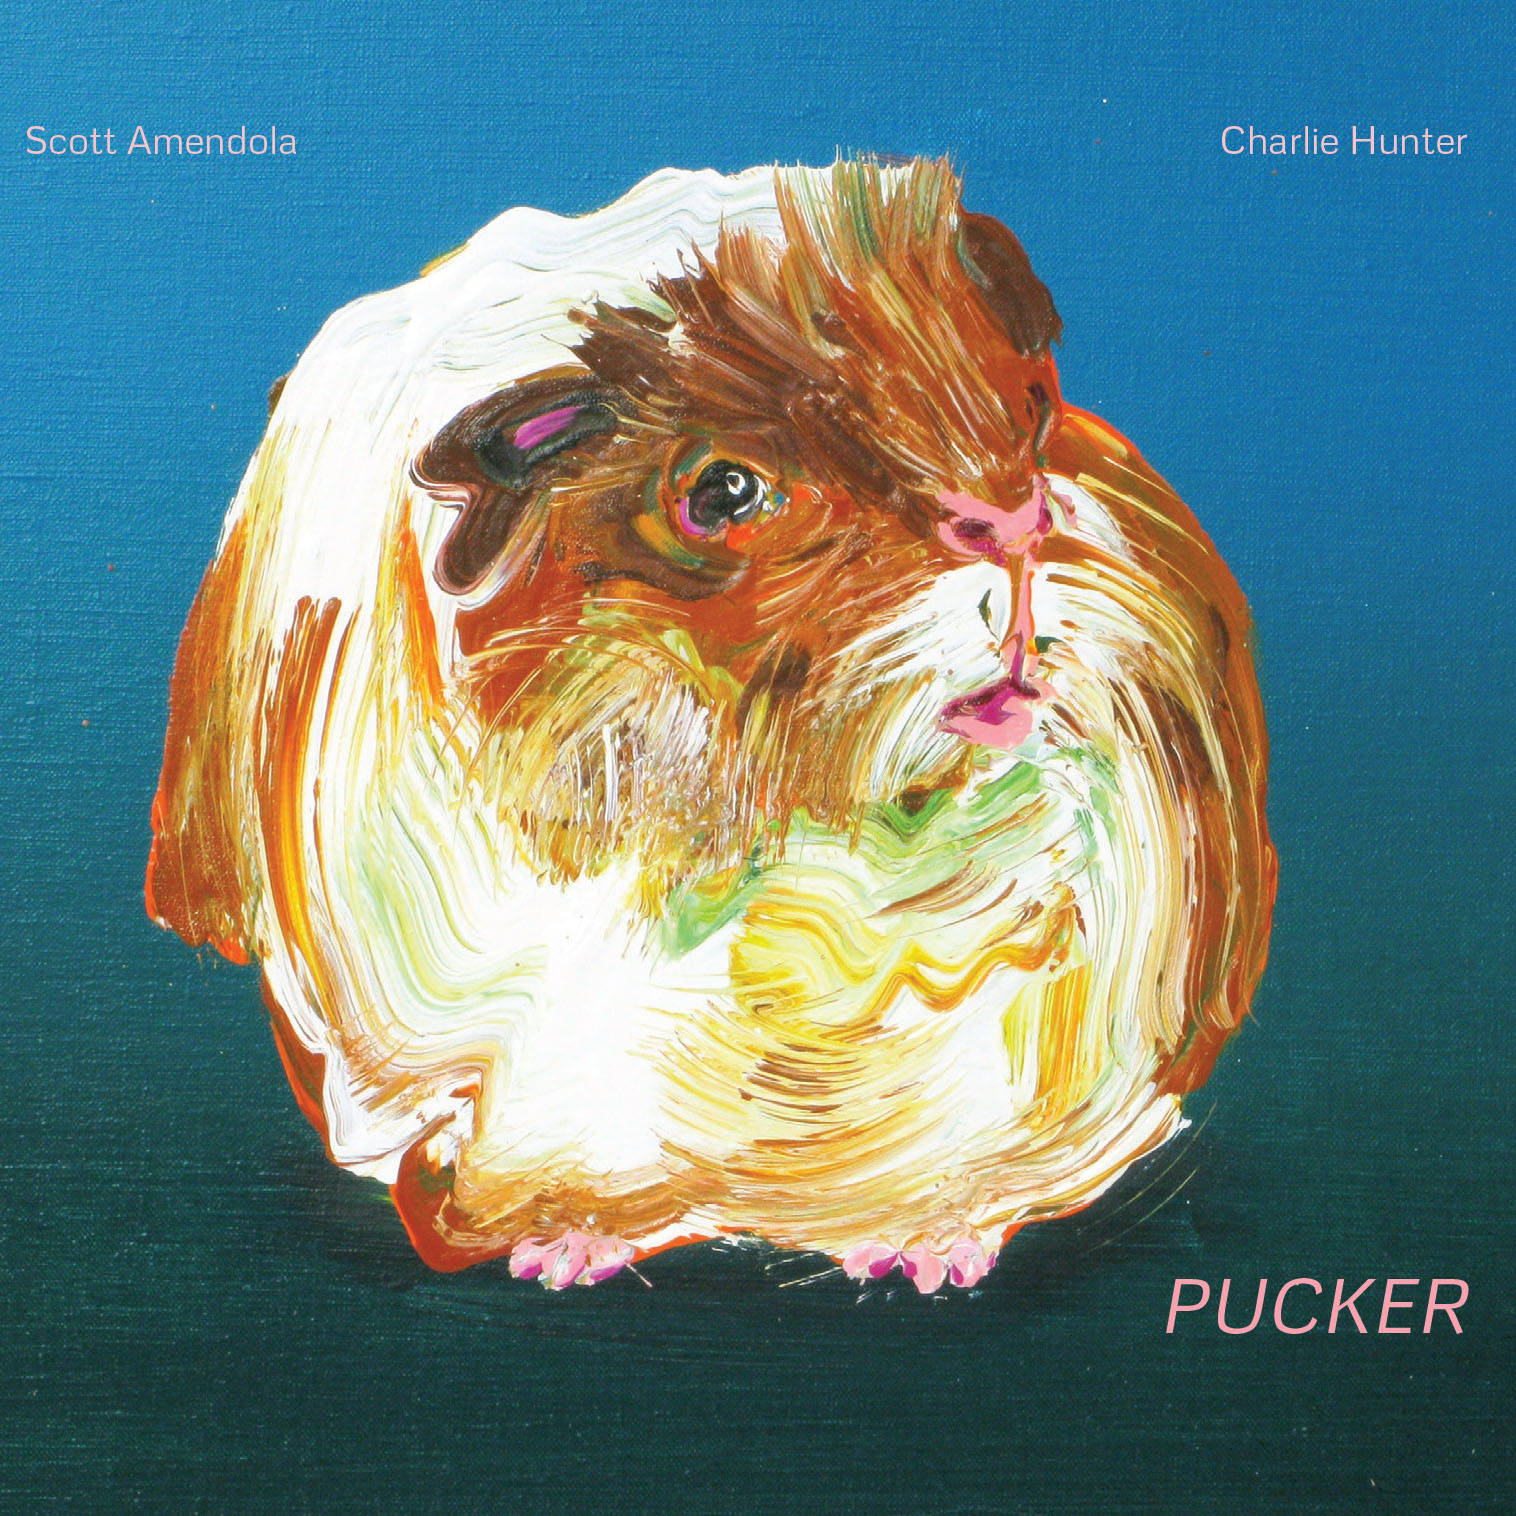 Scott Amendola & Charlie Hunter – Pucker